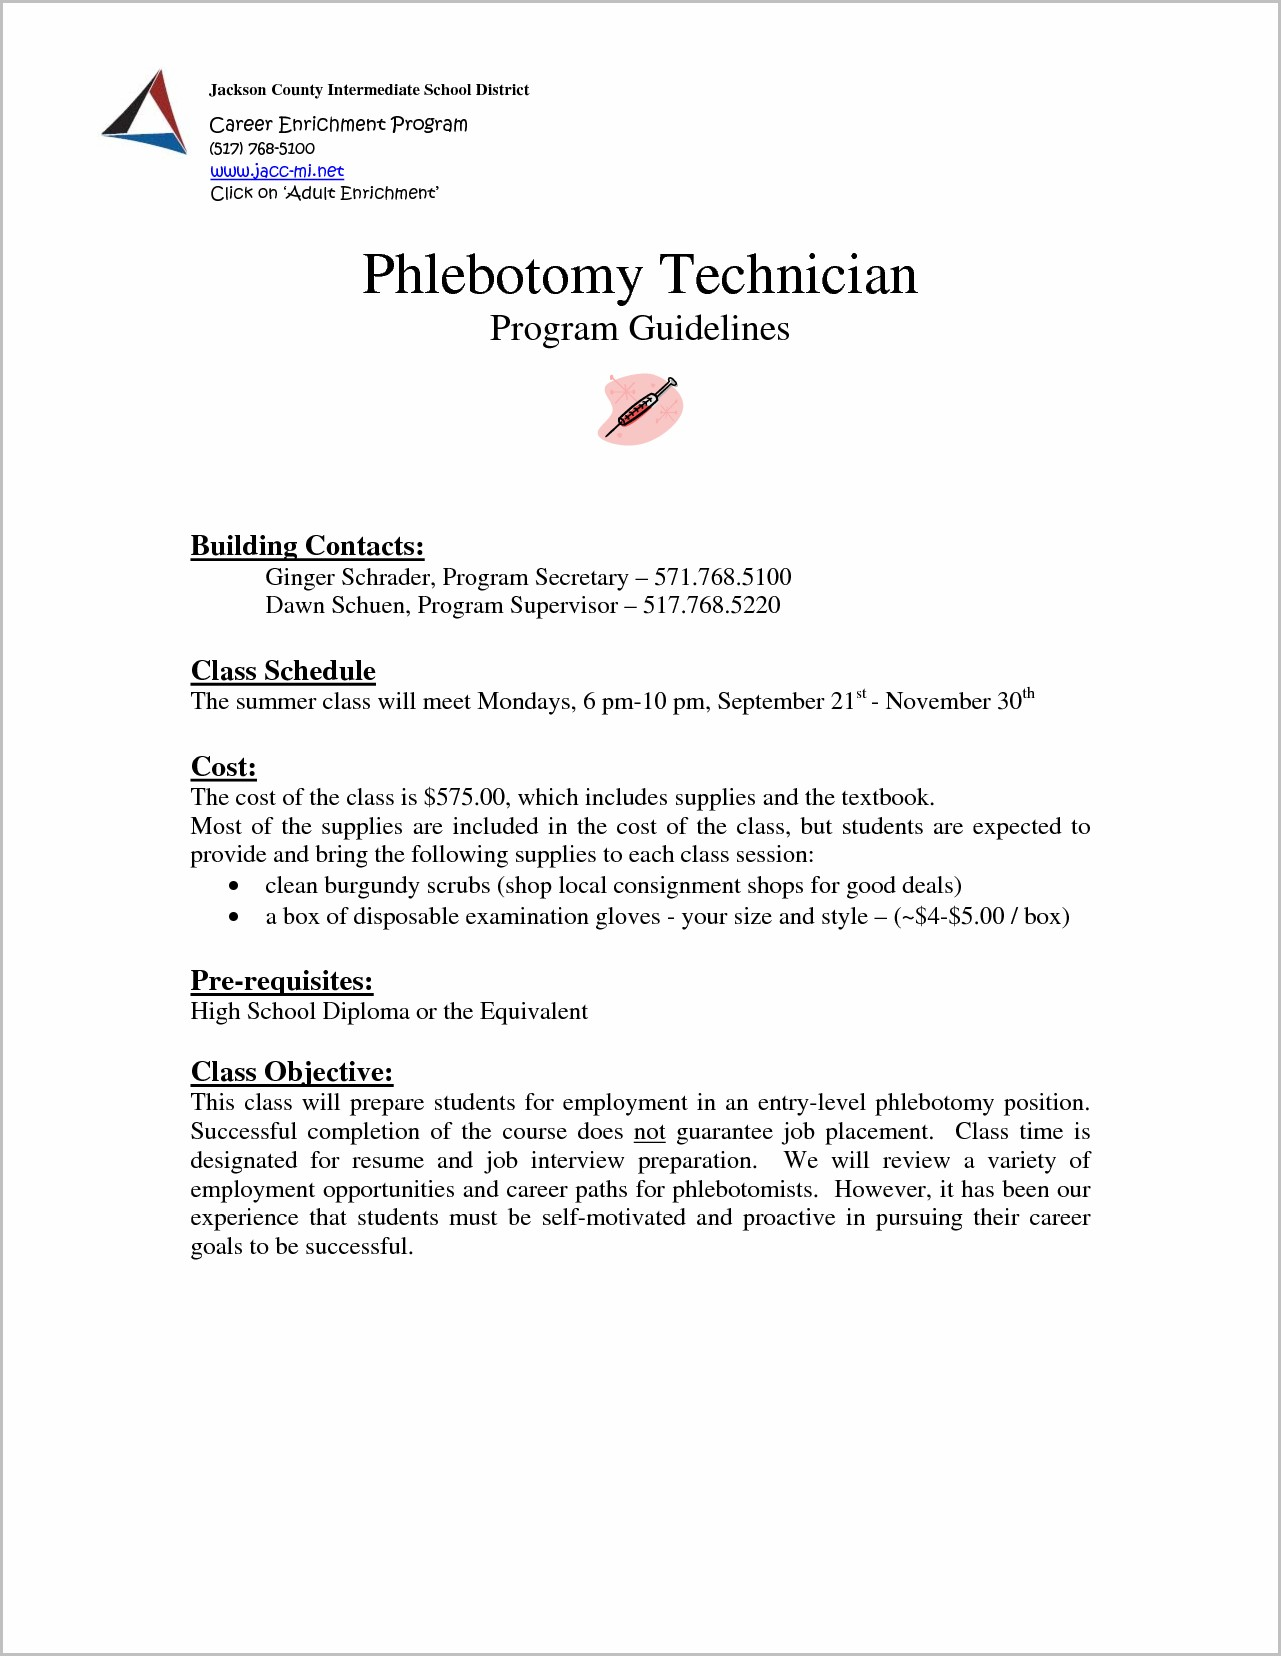 Resume Cover Letter Samples For Phlebotomists